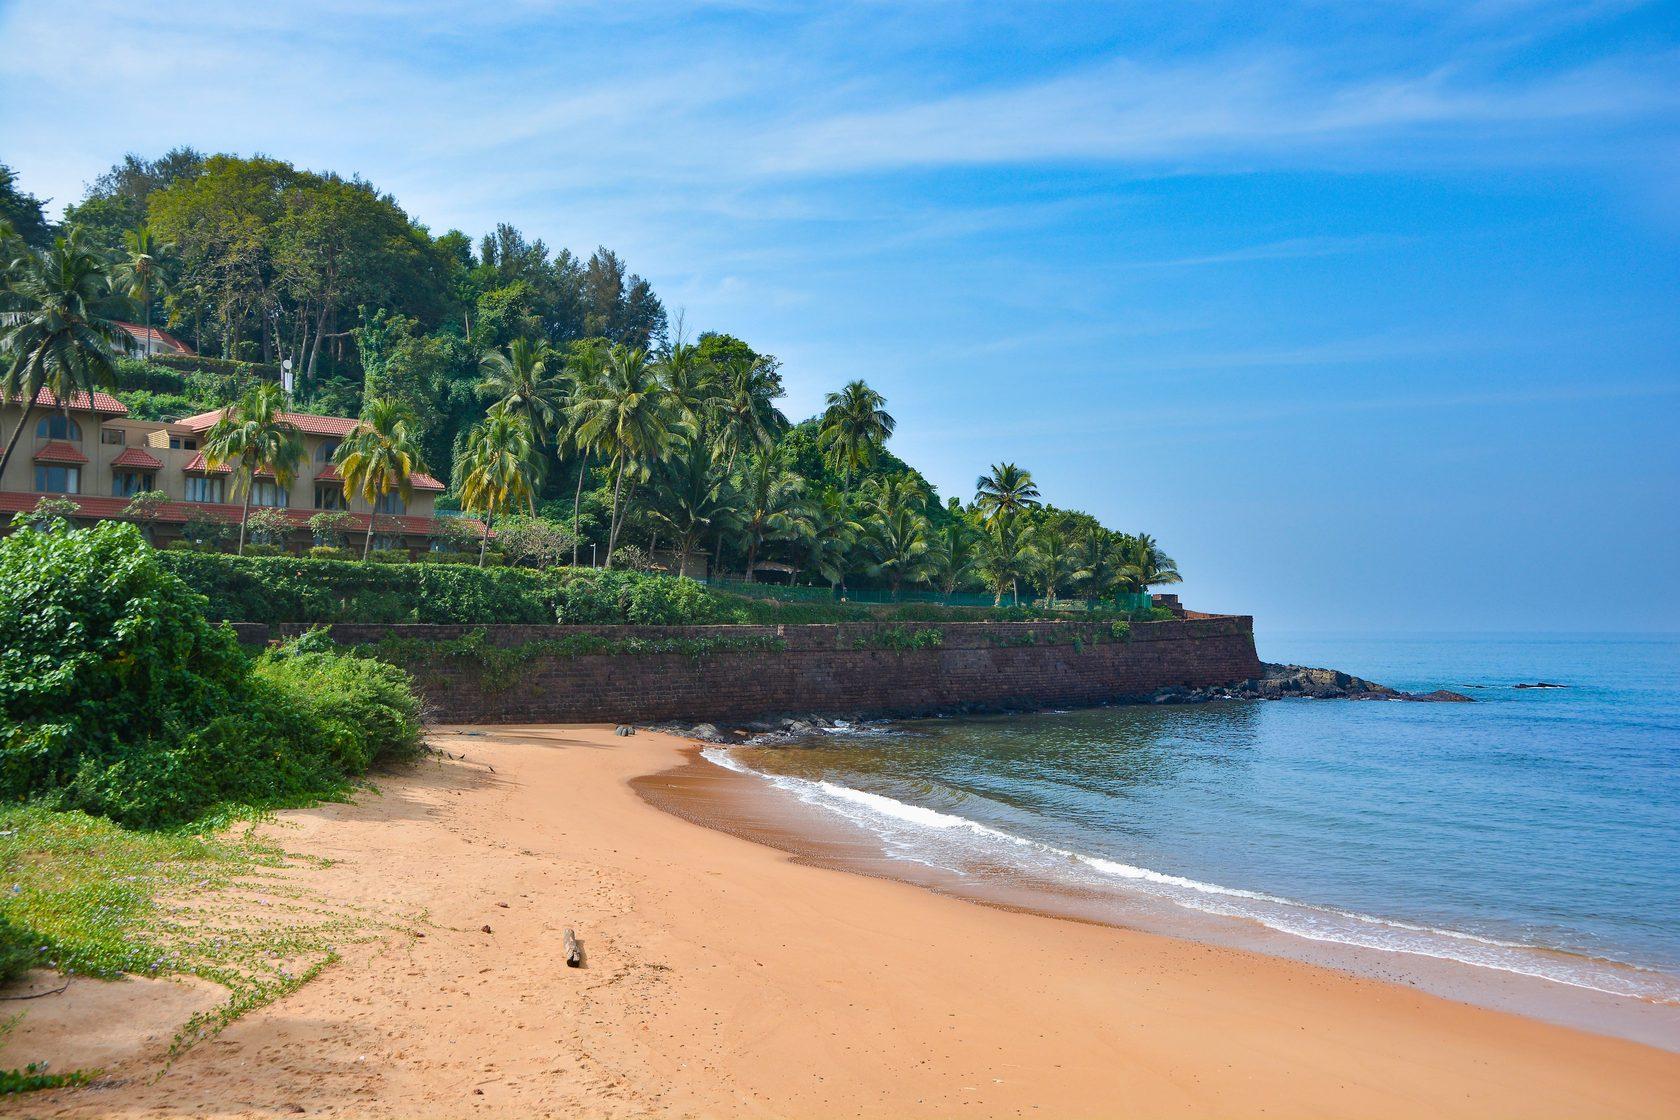 Sinquerim Beach, North Goa: How To Reach, Best Time & Tips